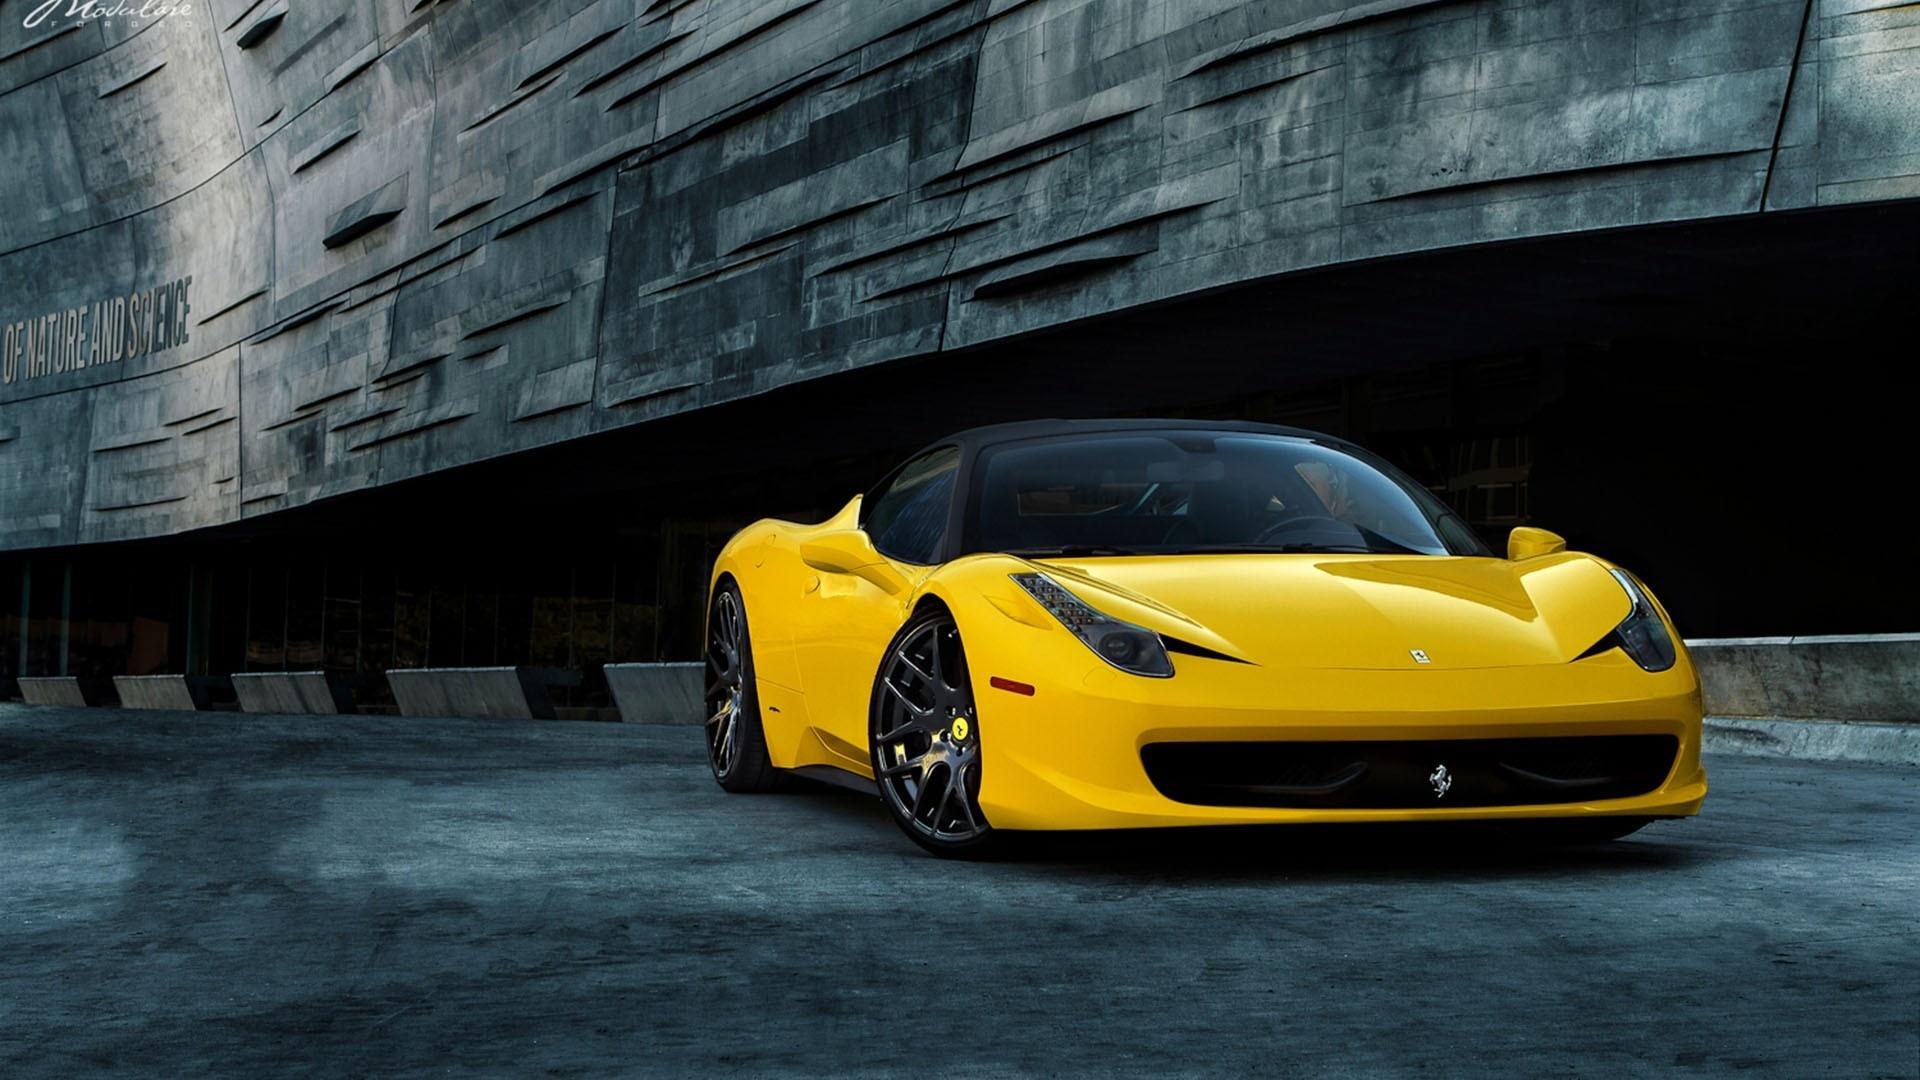 ferrari 458 yellow wallpaper